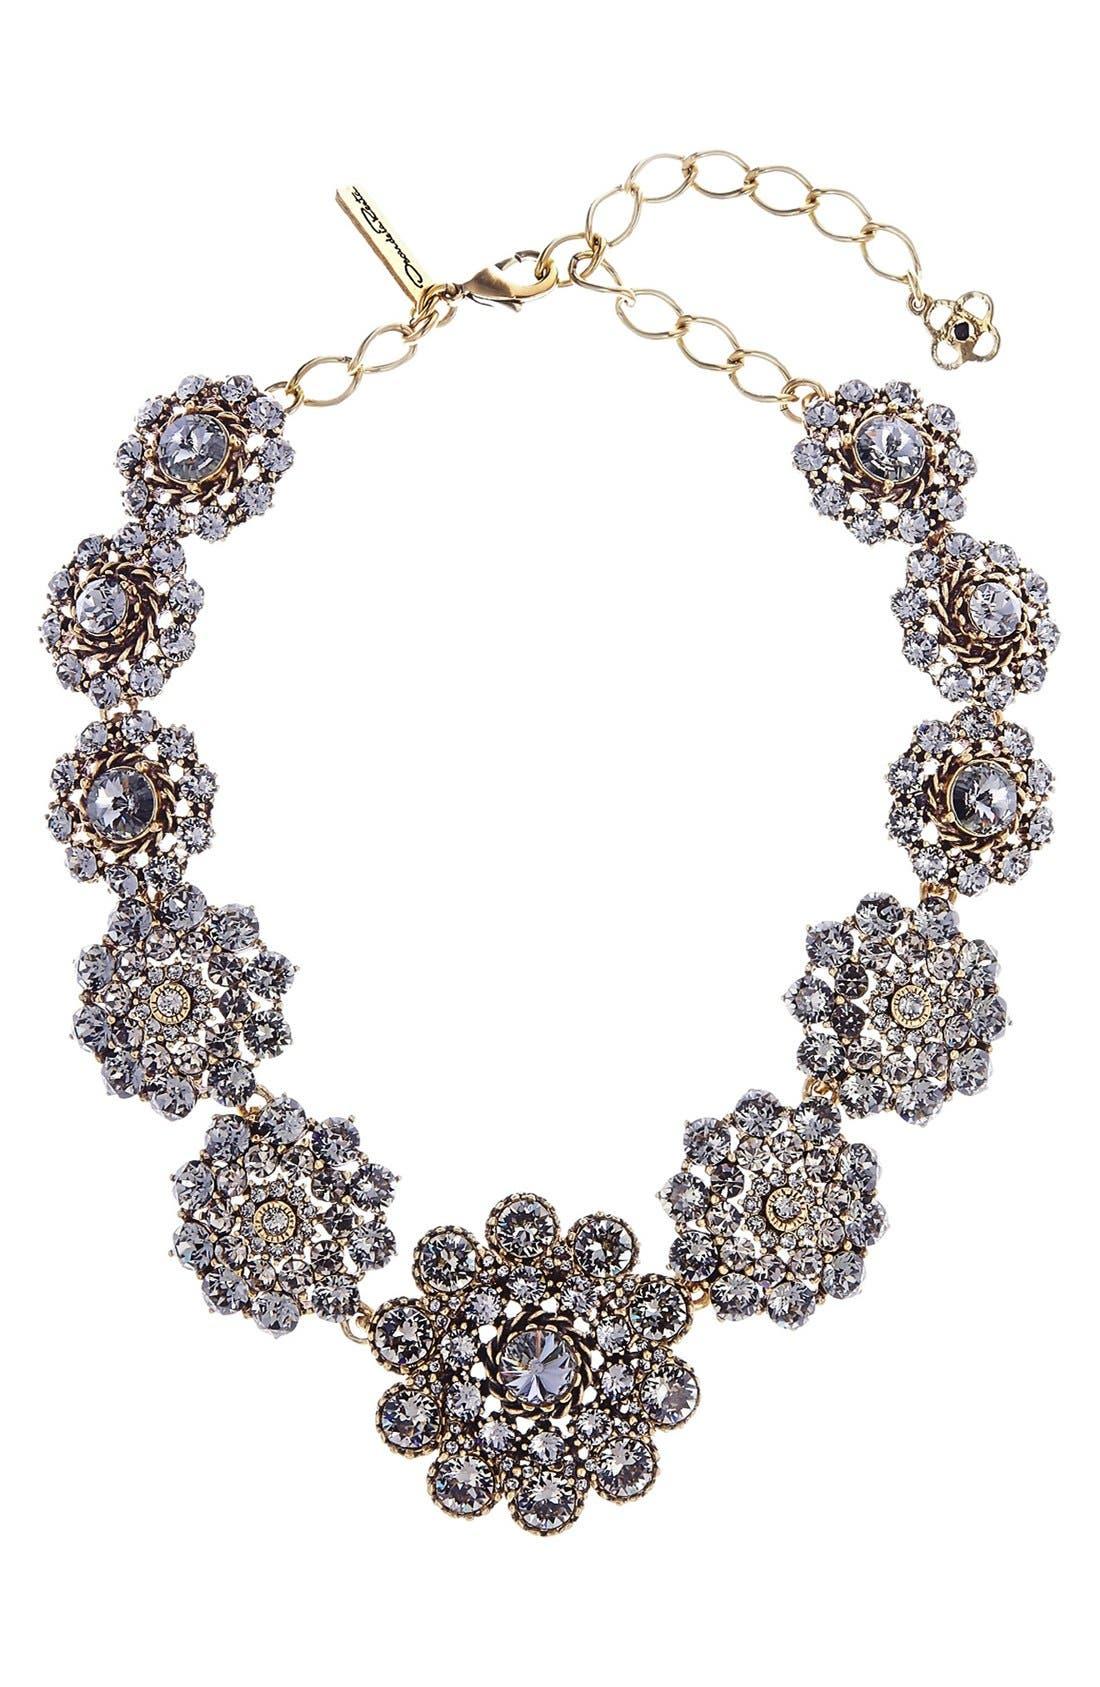 Swarovski Crystal Collar Necklace,                             Main thumbnail 1, color,                             BLACK